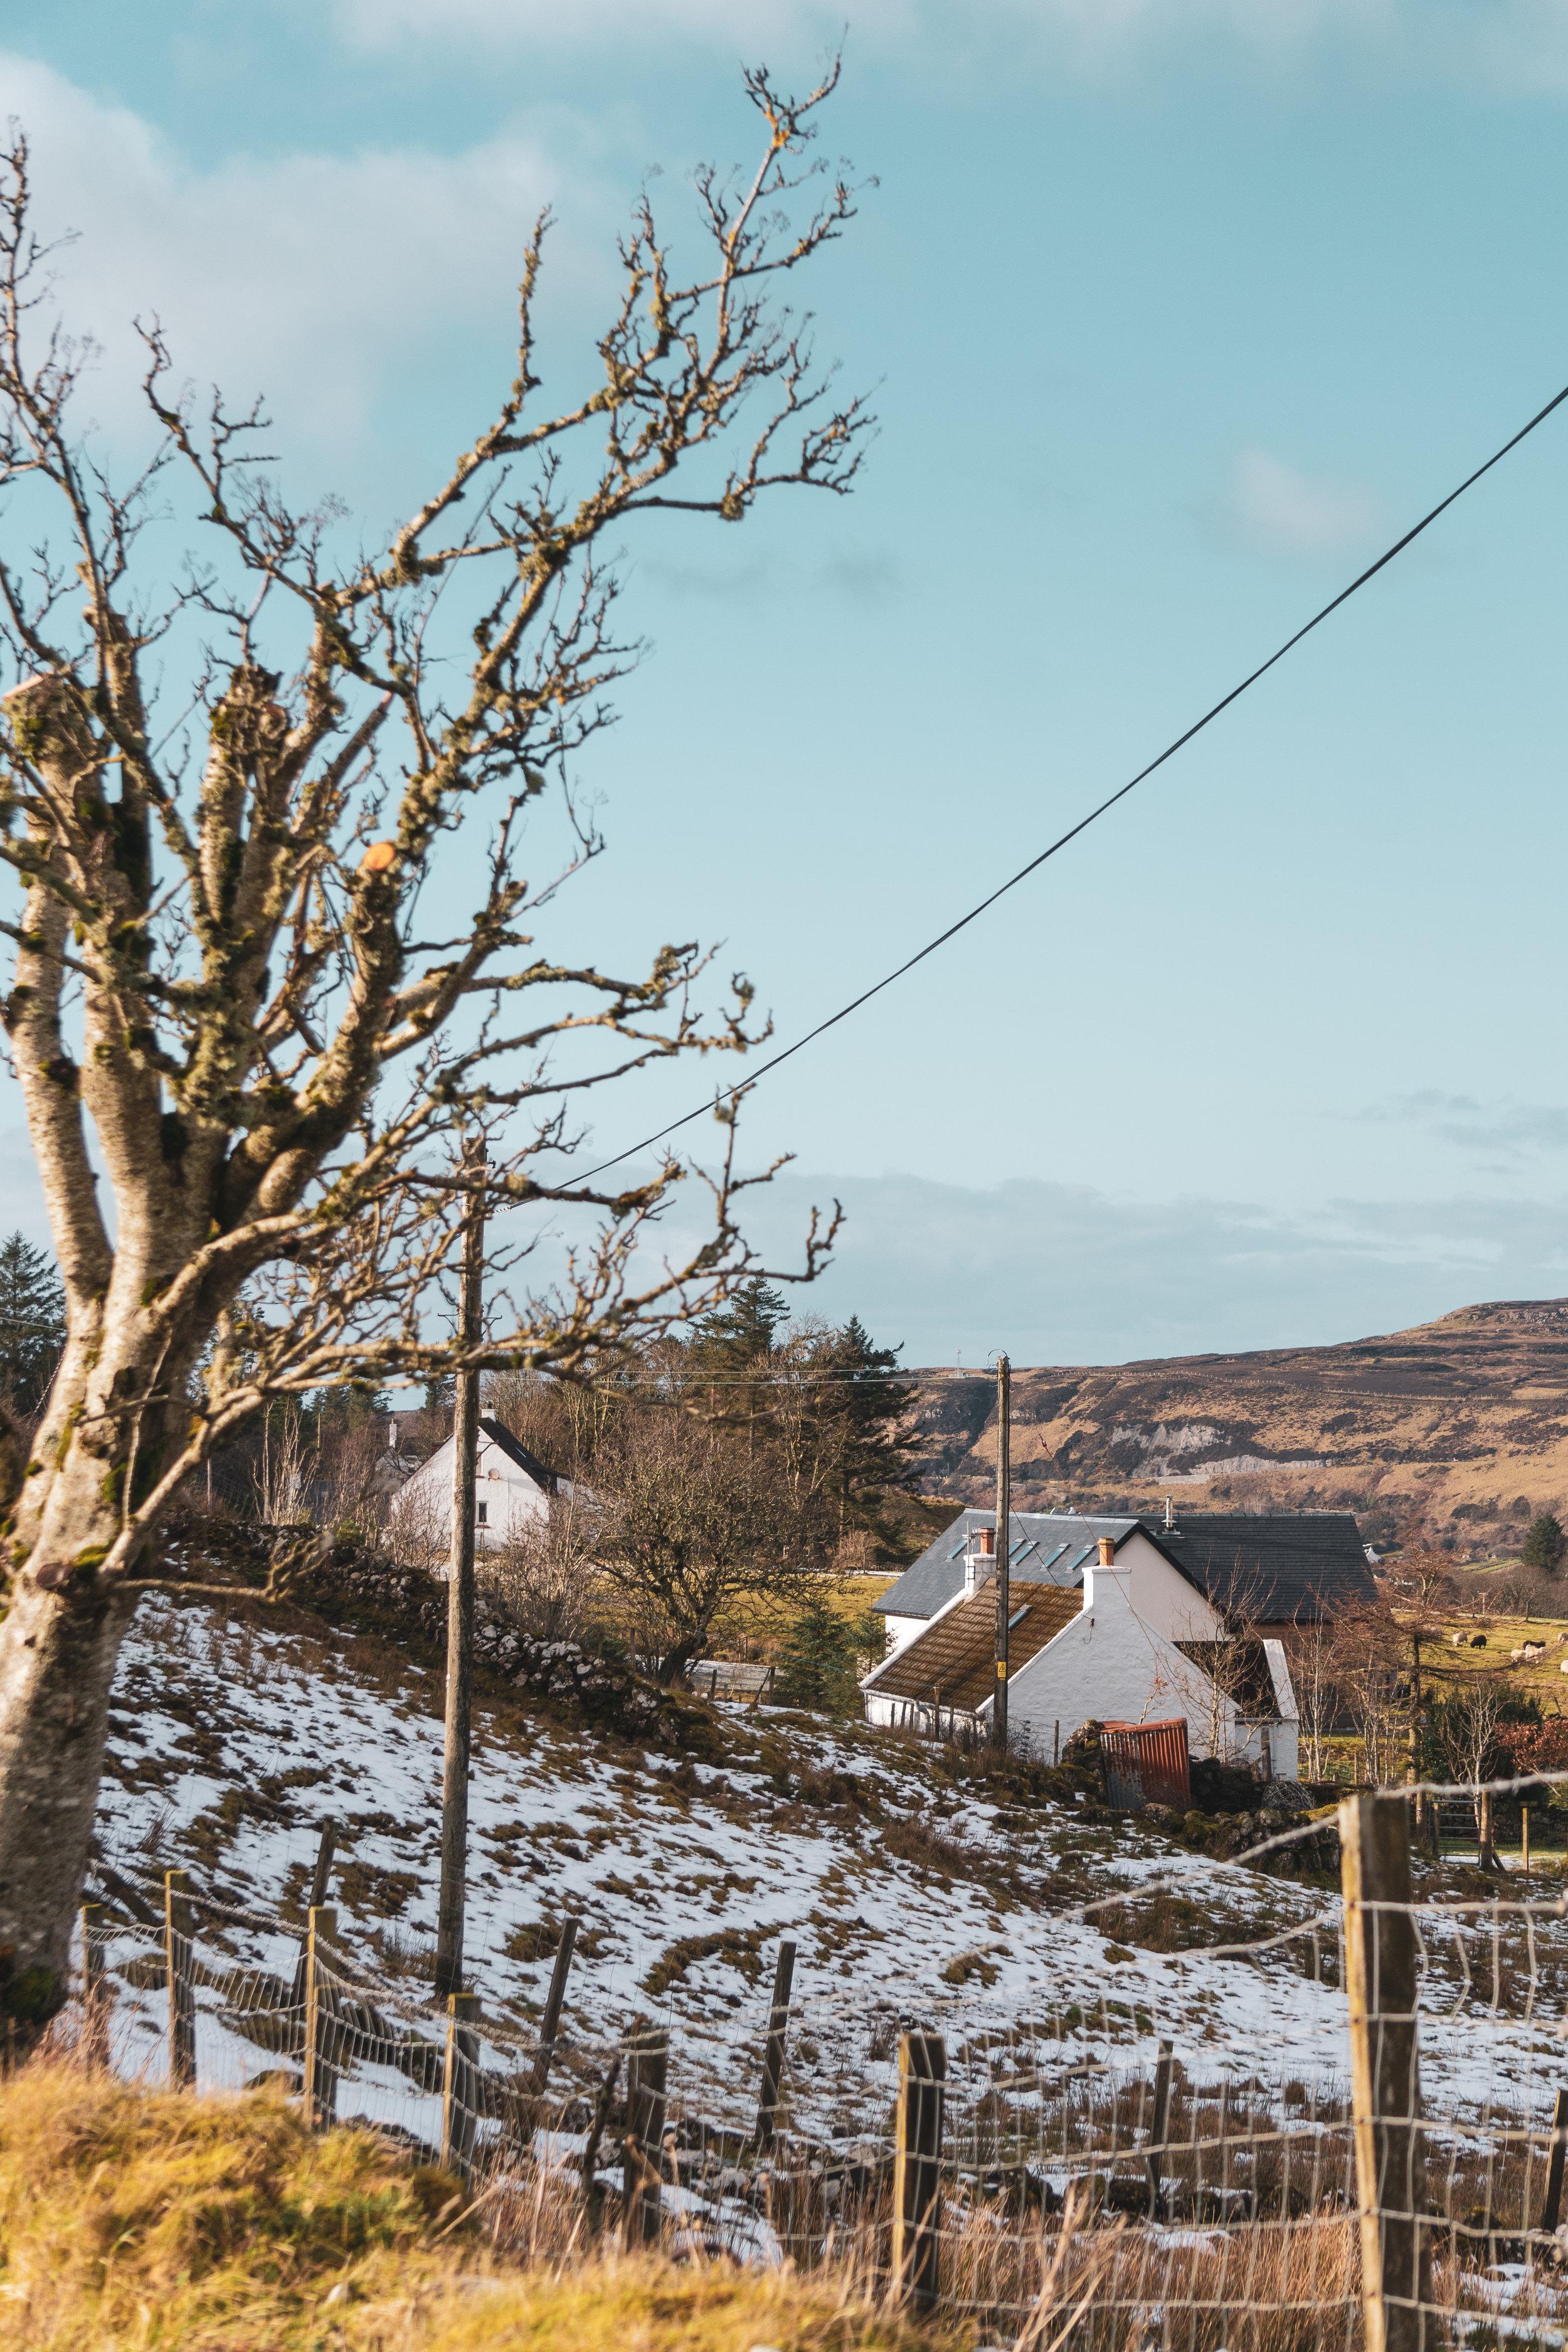 Isle-of-Skye-Fairy-Glen-und-Braes (23).jpg